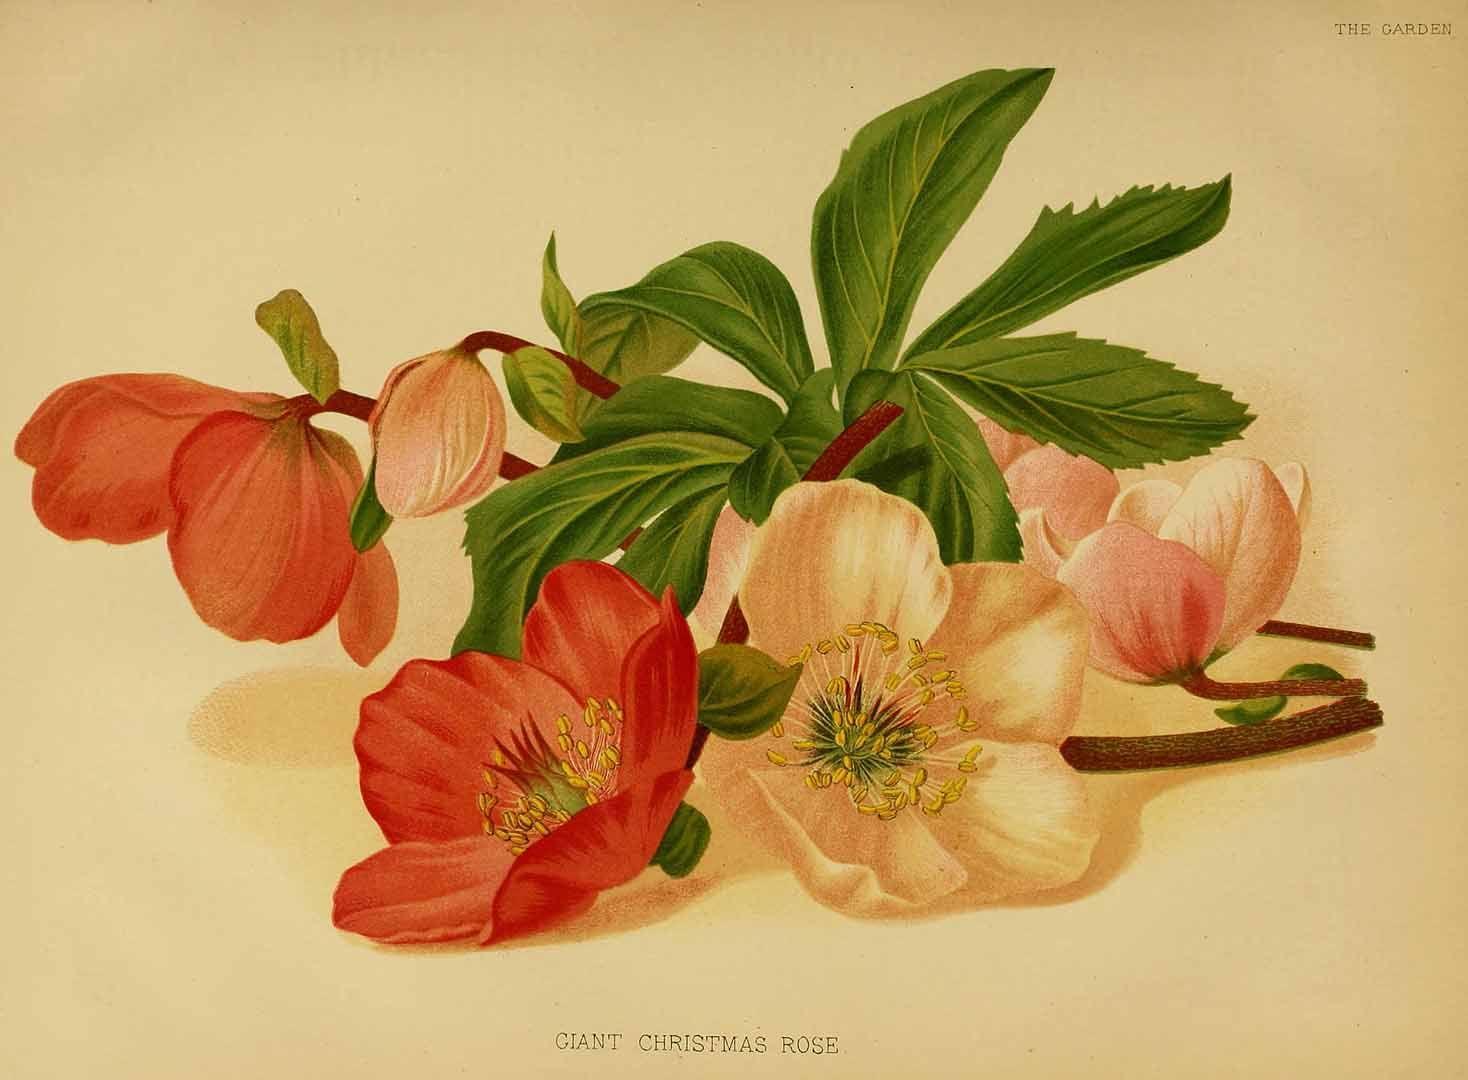 Giant Christmas Rose - Helleborus niger L. Christmas rose Seboth, J., Graf, F., Die Alpenpflanzen nach der Natur gemalt, vol. 1: t. 10 (1839)